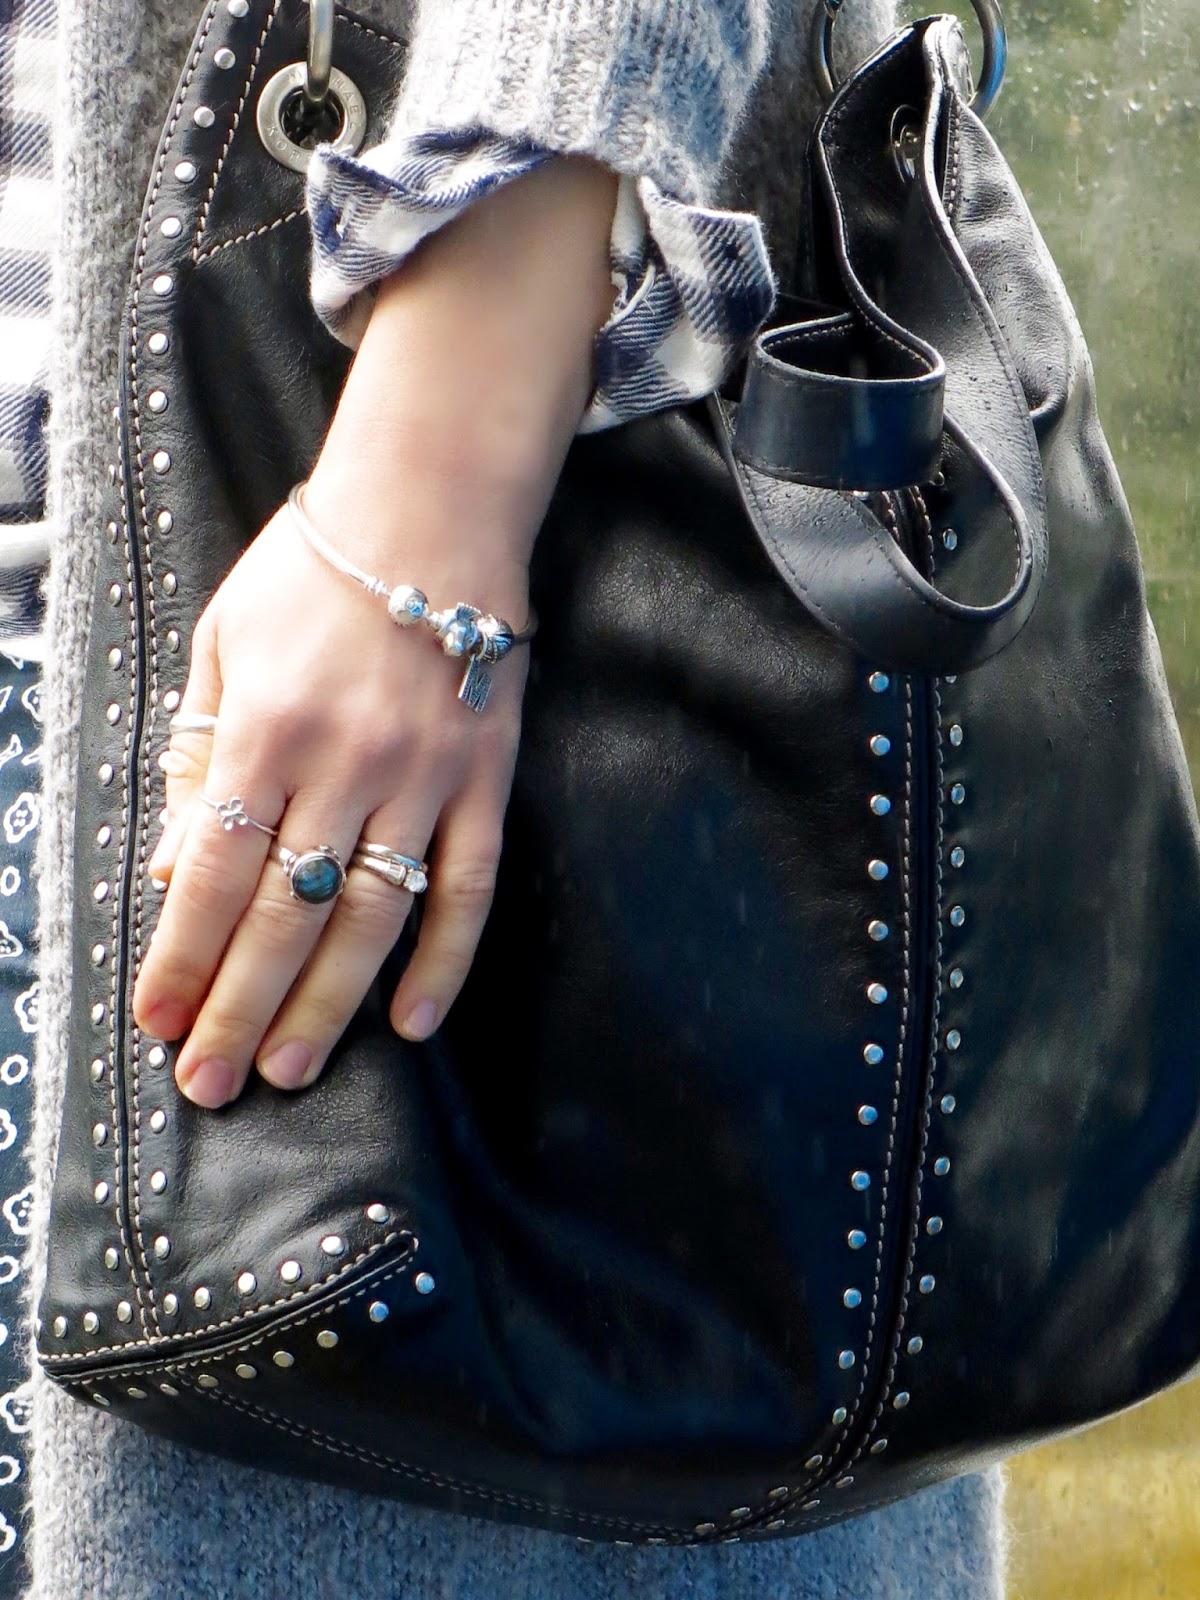 Michael Kors bag, Pandora bracelet